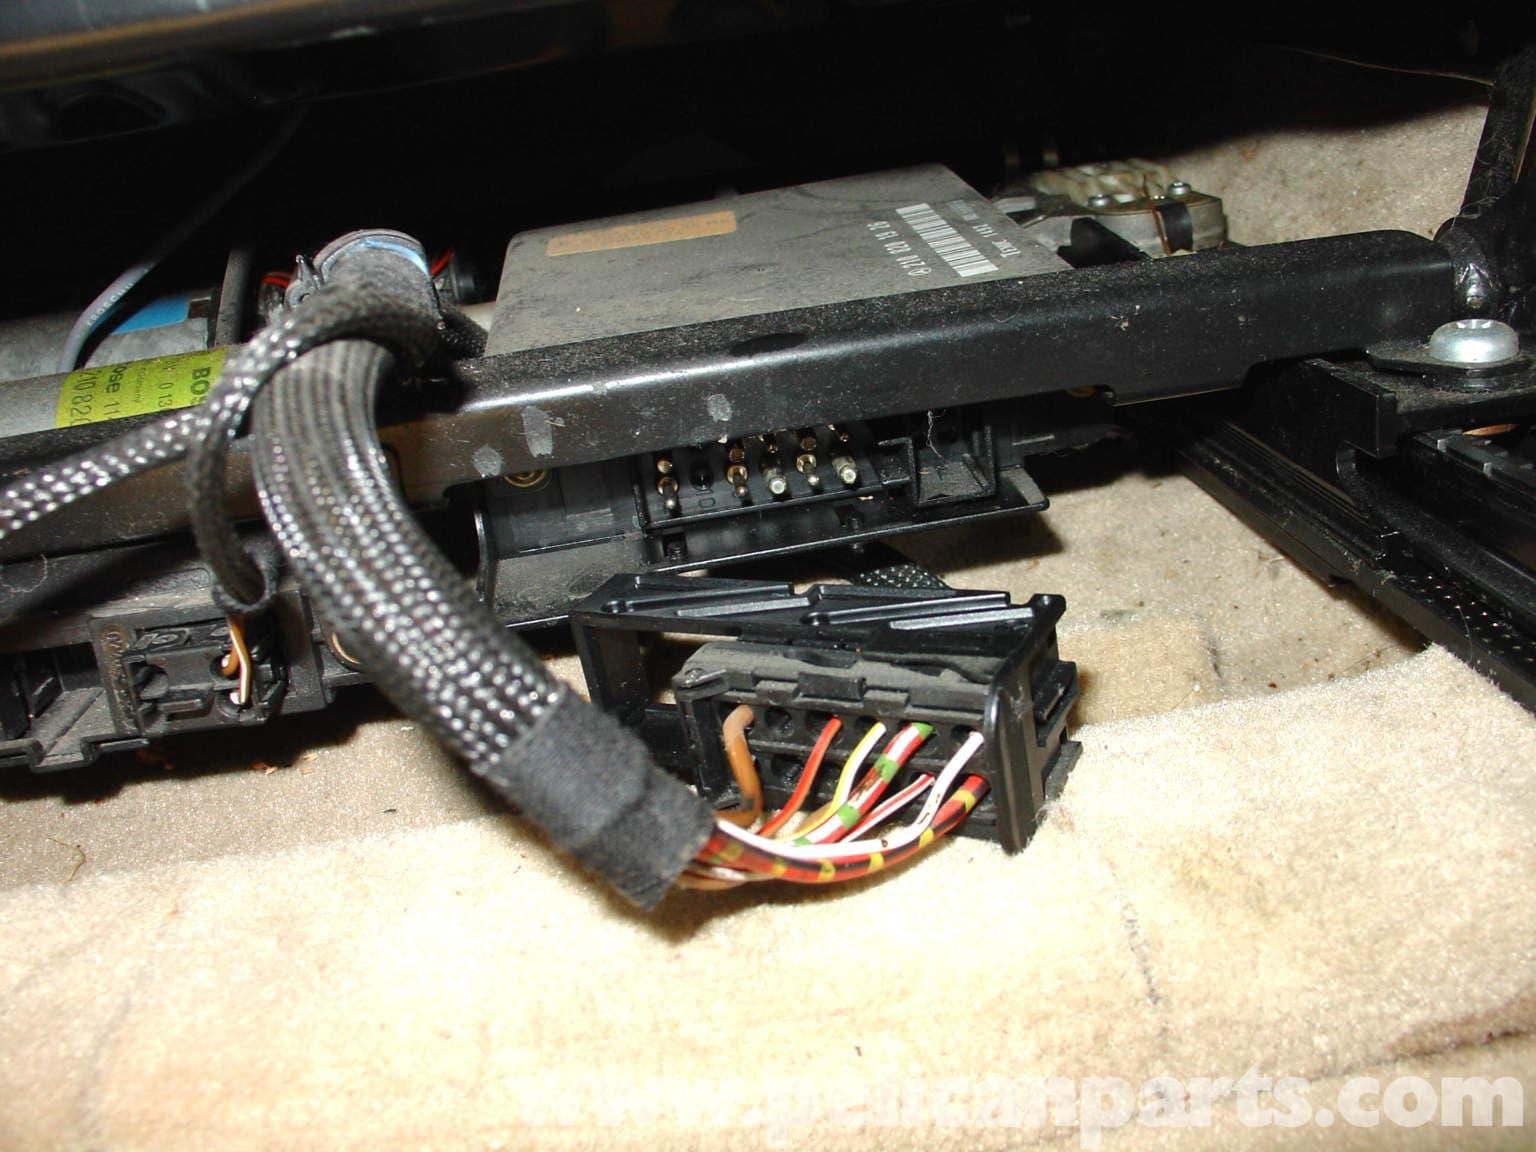 ecu wiring diagram mercedes airbag suspension mercedes-benz w210 brake bleeding (1996-03) e320, e420 | pelican parts diy maintenance article